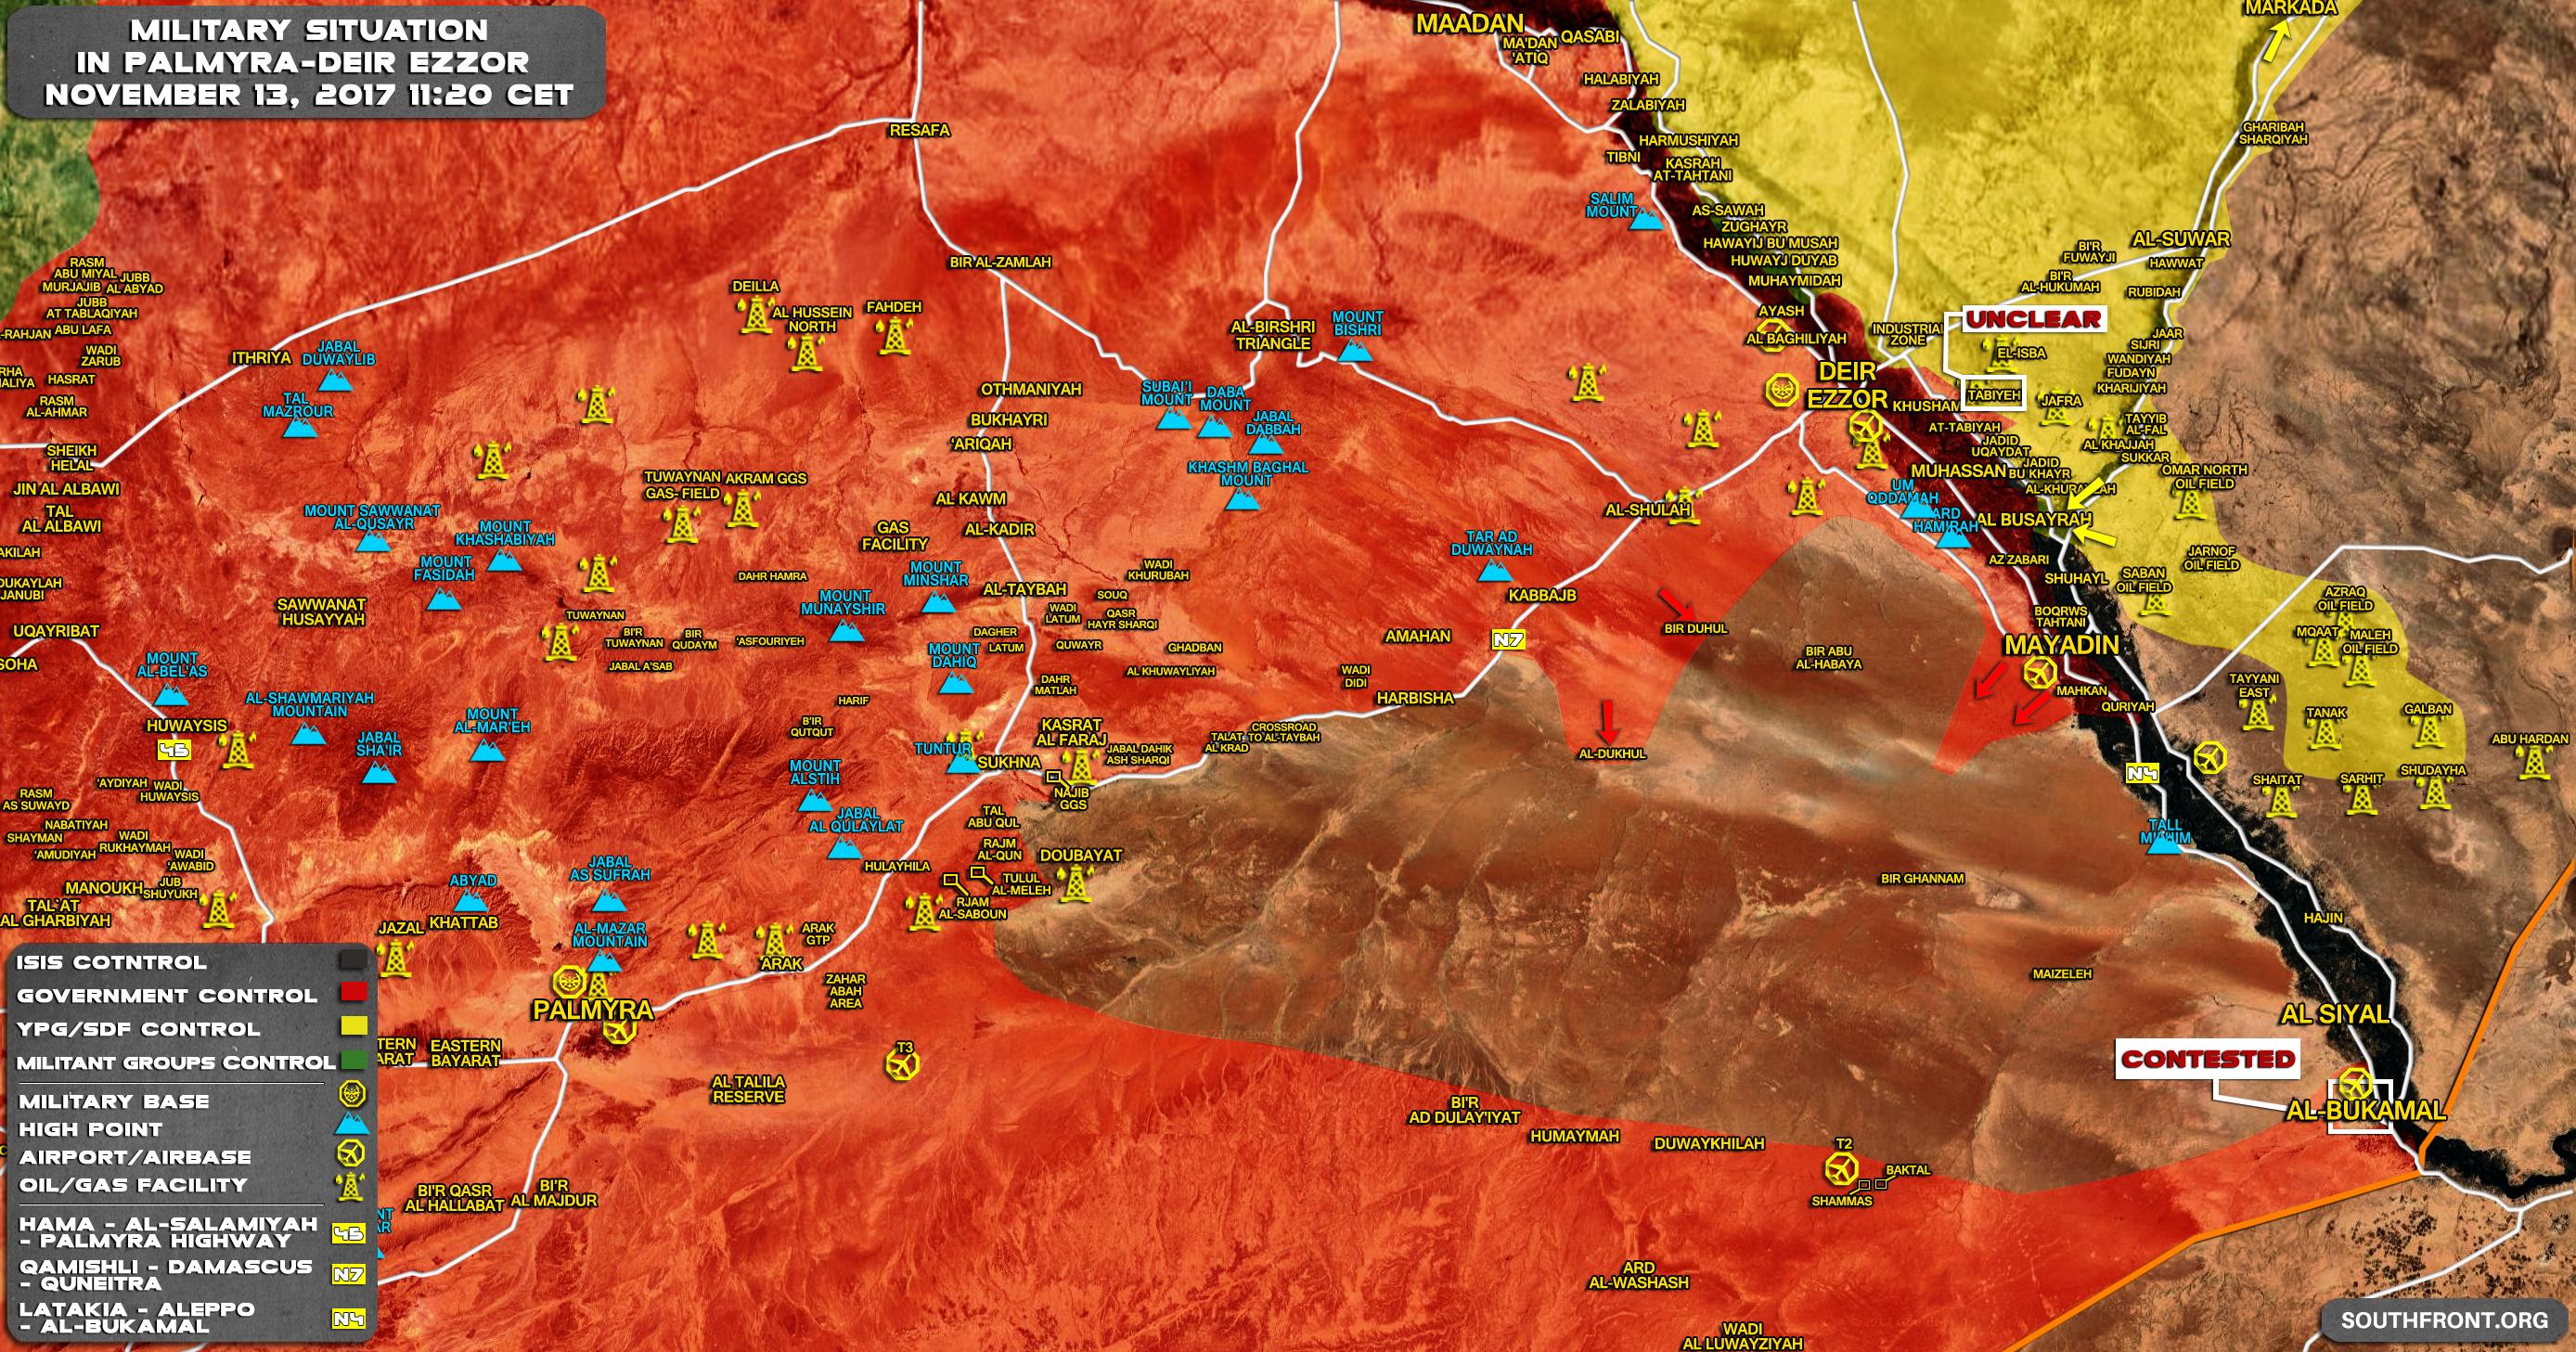 Situation im Gebiet Palmyra-Deir-ez-Zor